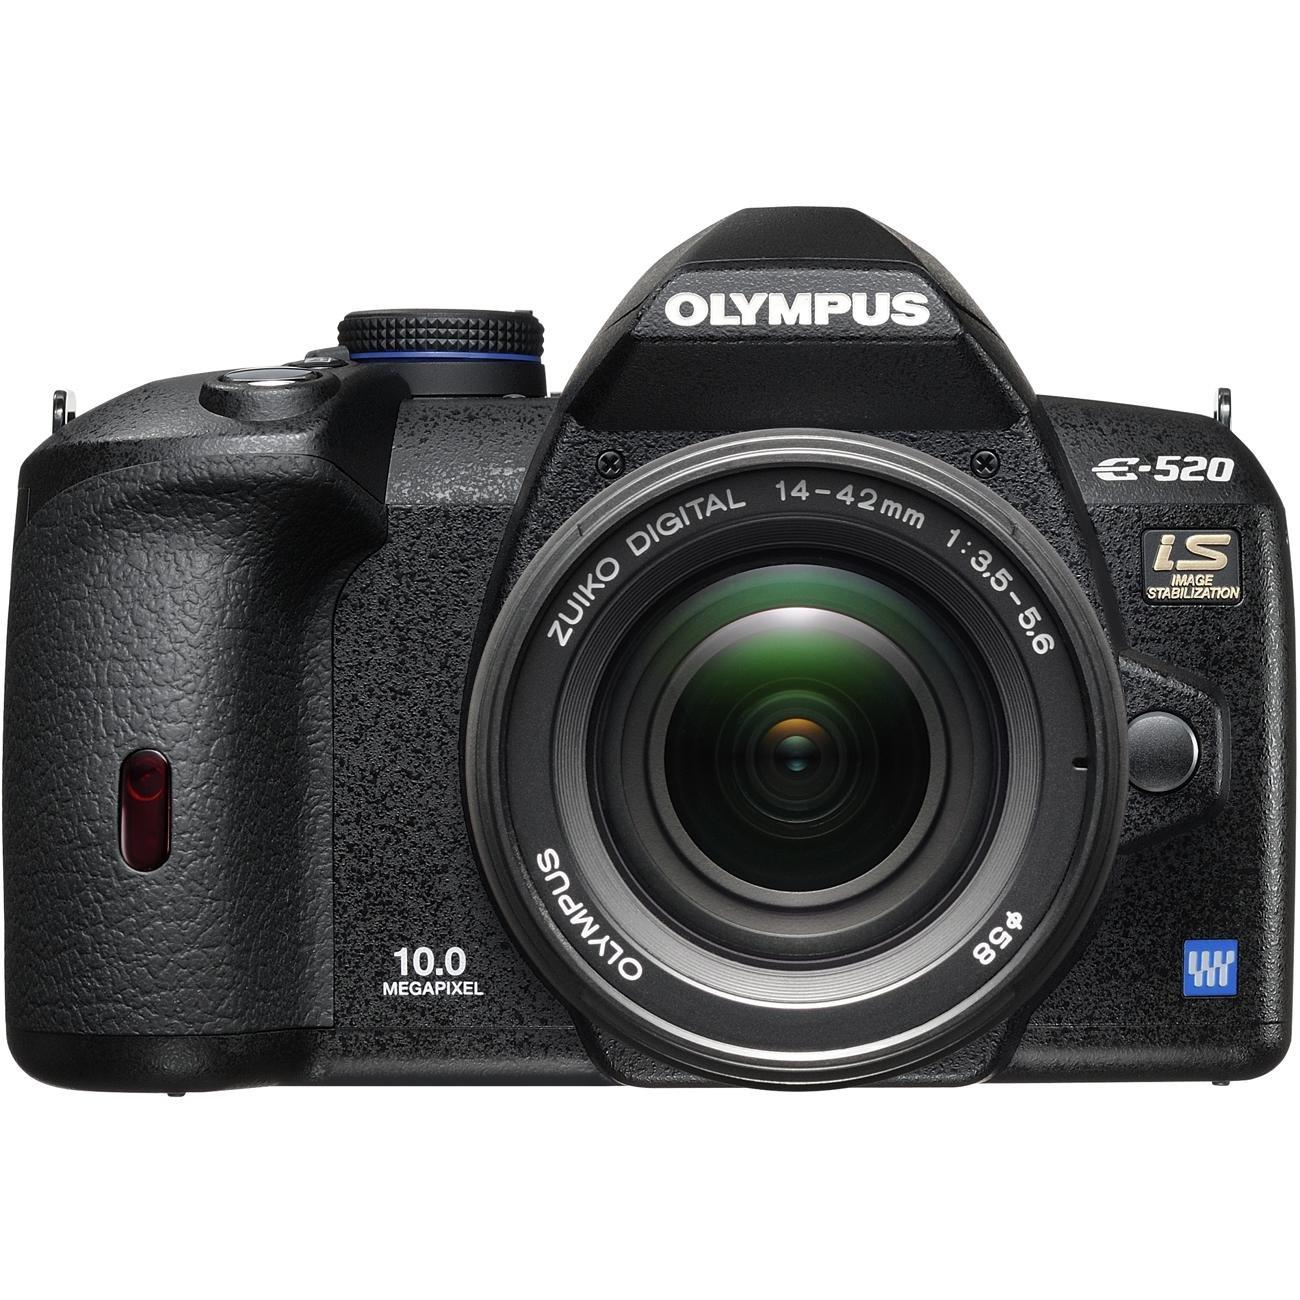 Olympus Evolt E520